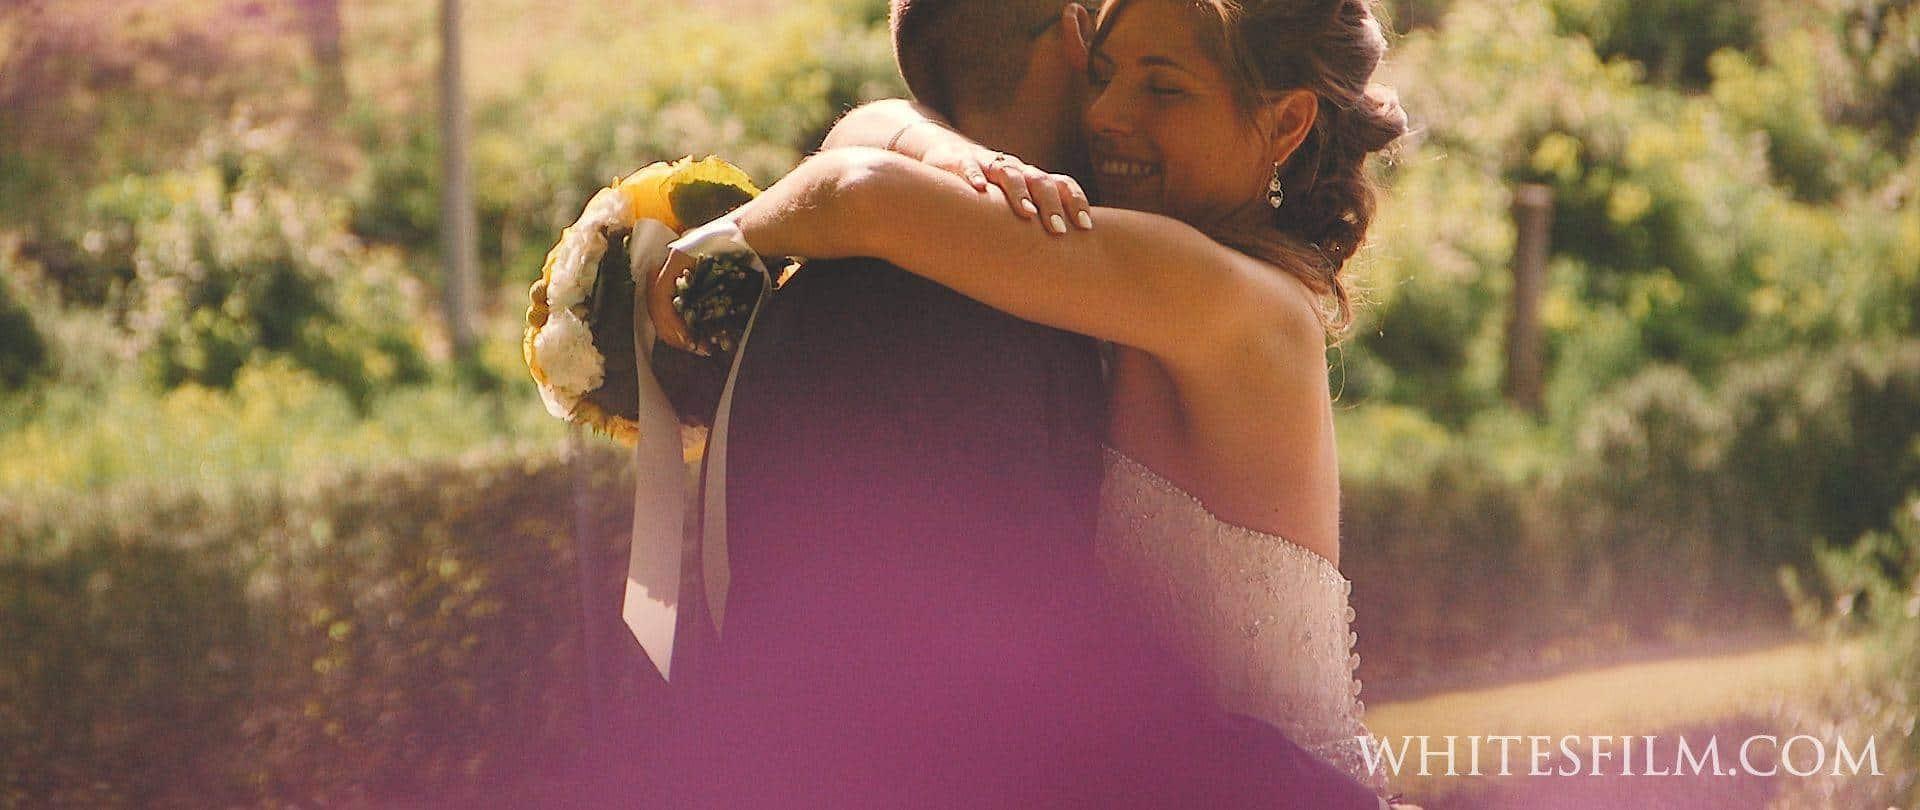 Whitesfilm wedding filmmaker love hug - Luxury Wedding Gallery